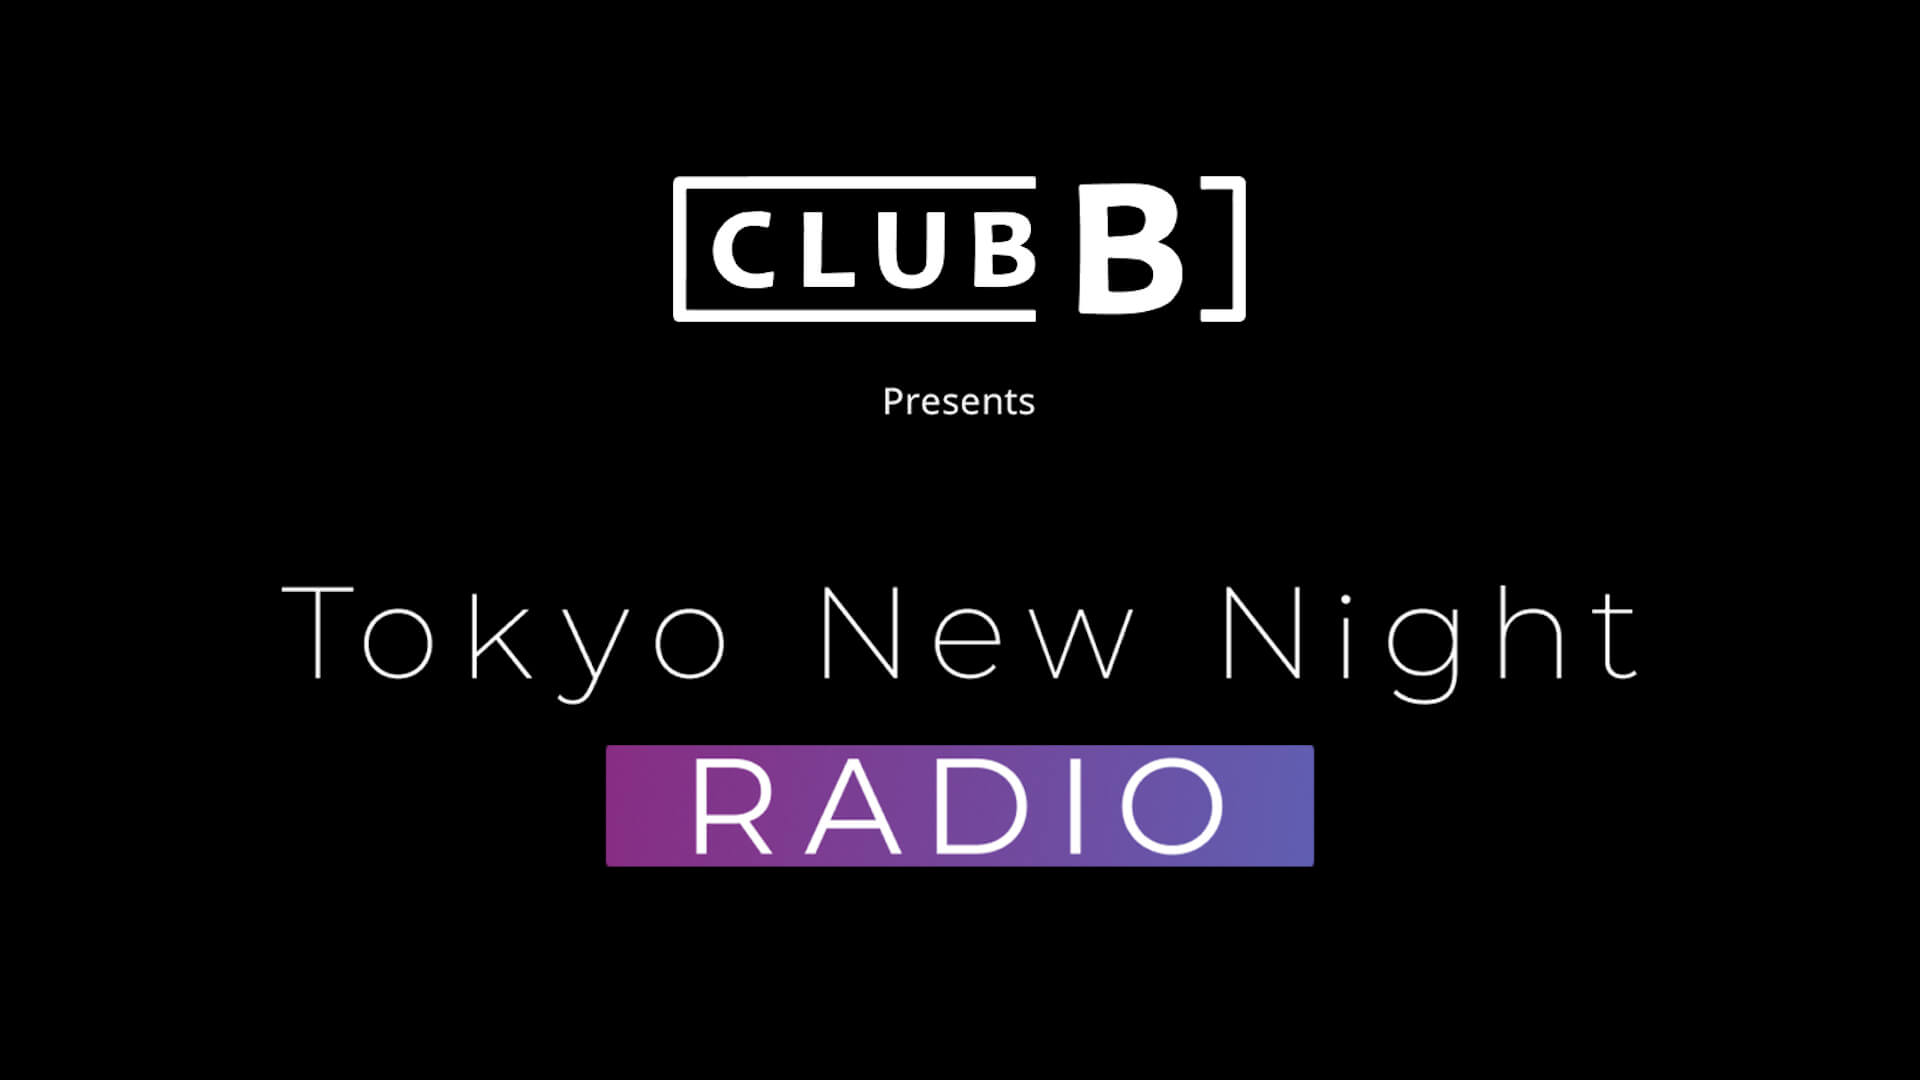 PES、Seihoと東京のナイトカルチャーについて語る<CLUB B Presents Tokyo New Night Radio>ライブ配信イベントが開催! music210624_ClubB_PES_siho2